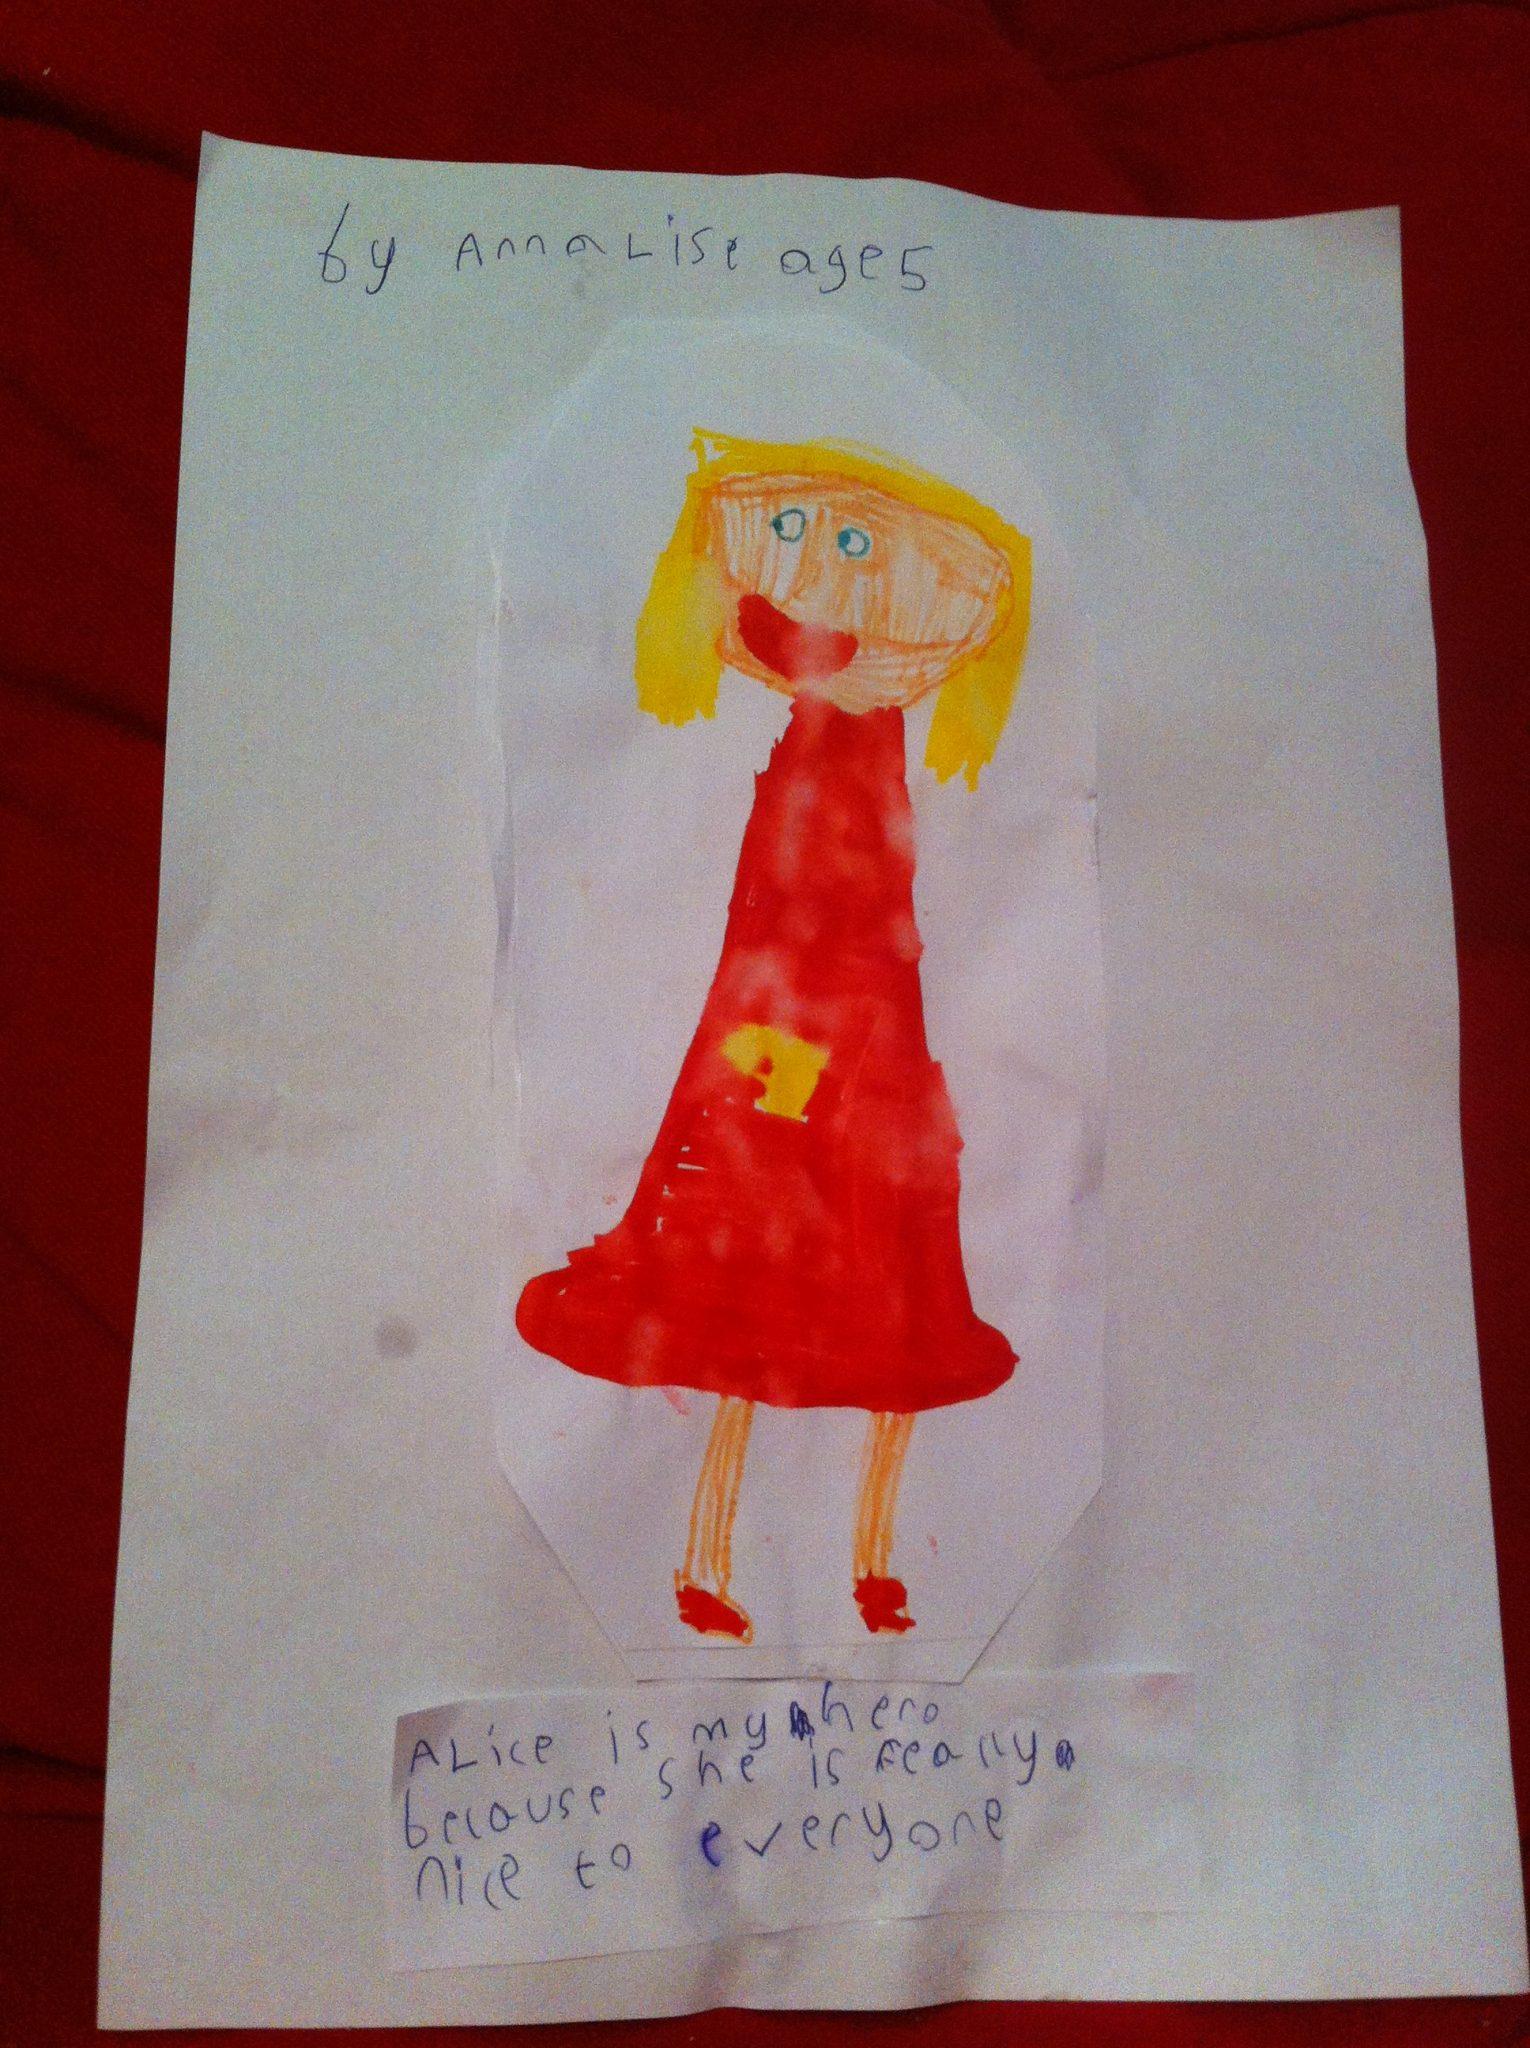 My Hero by Annalise, age 5